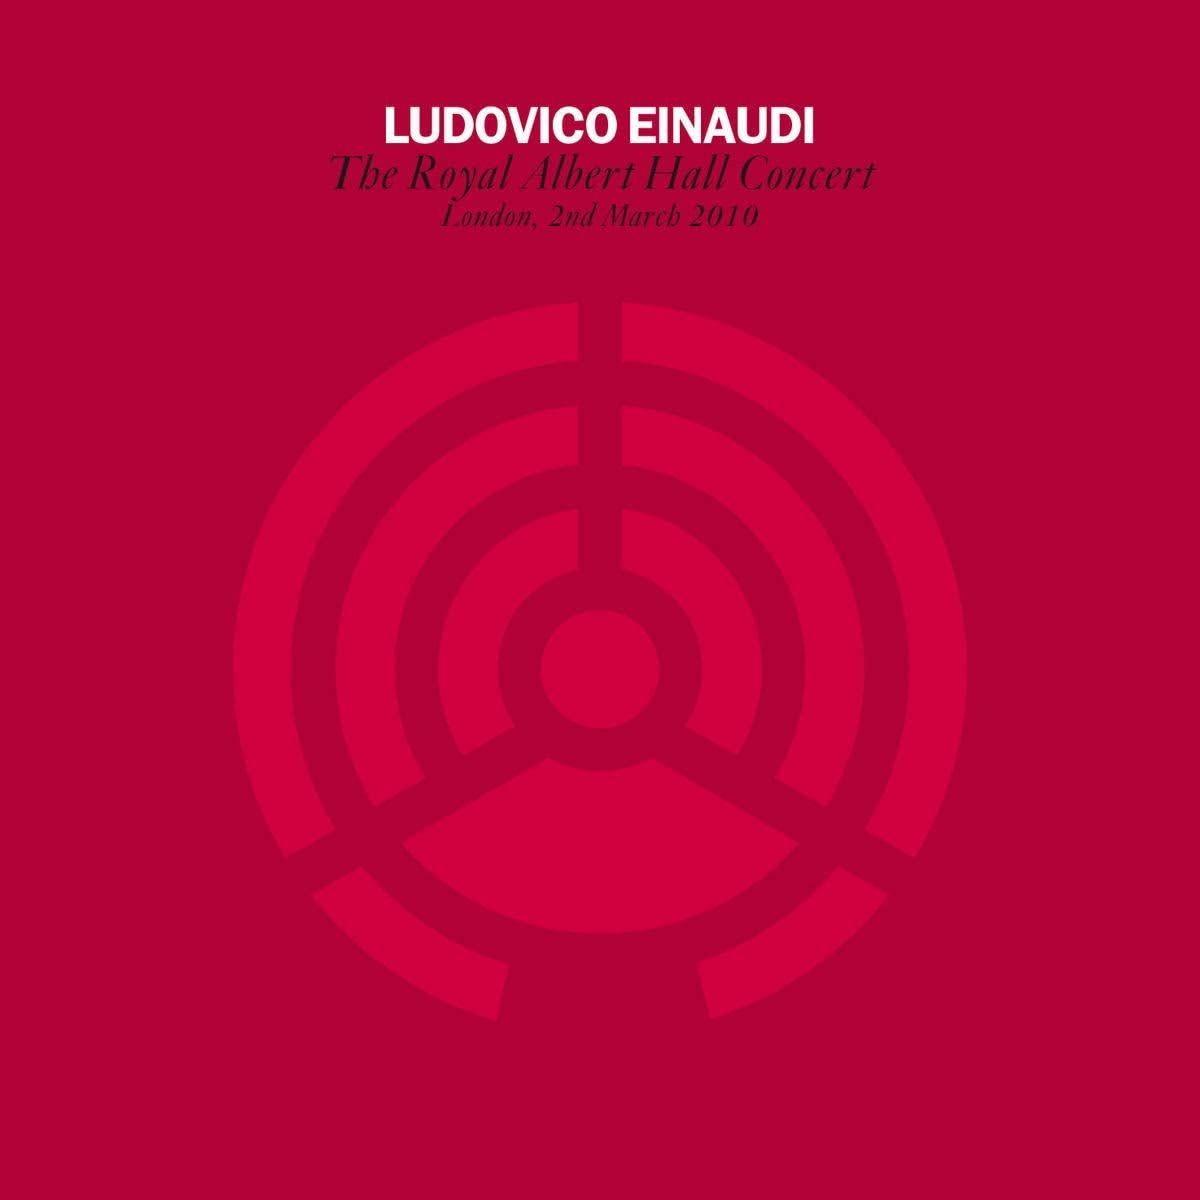 Photo No.1 of Ludovico Einaudi - The Royal Albert Hall Concert